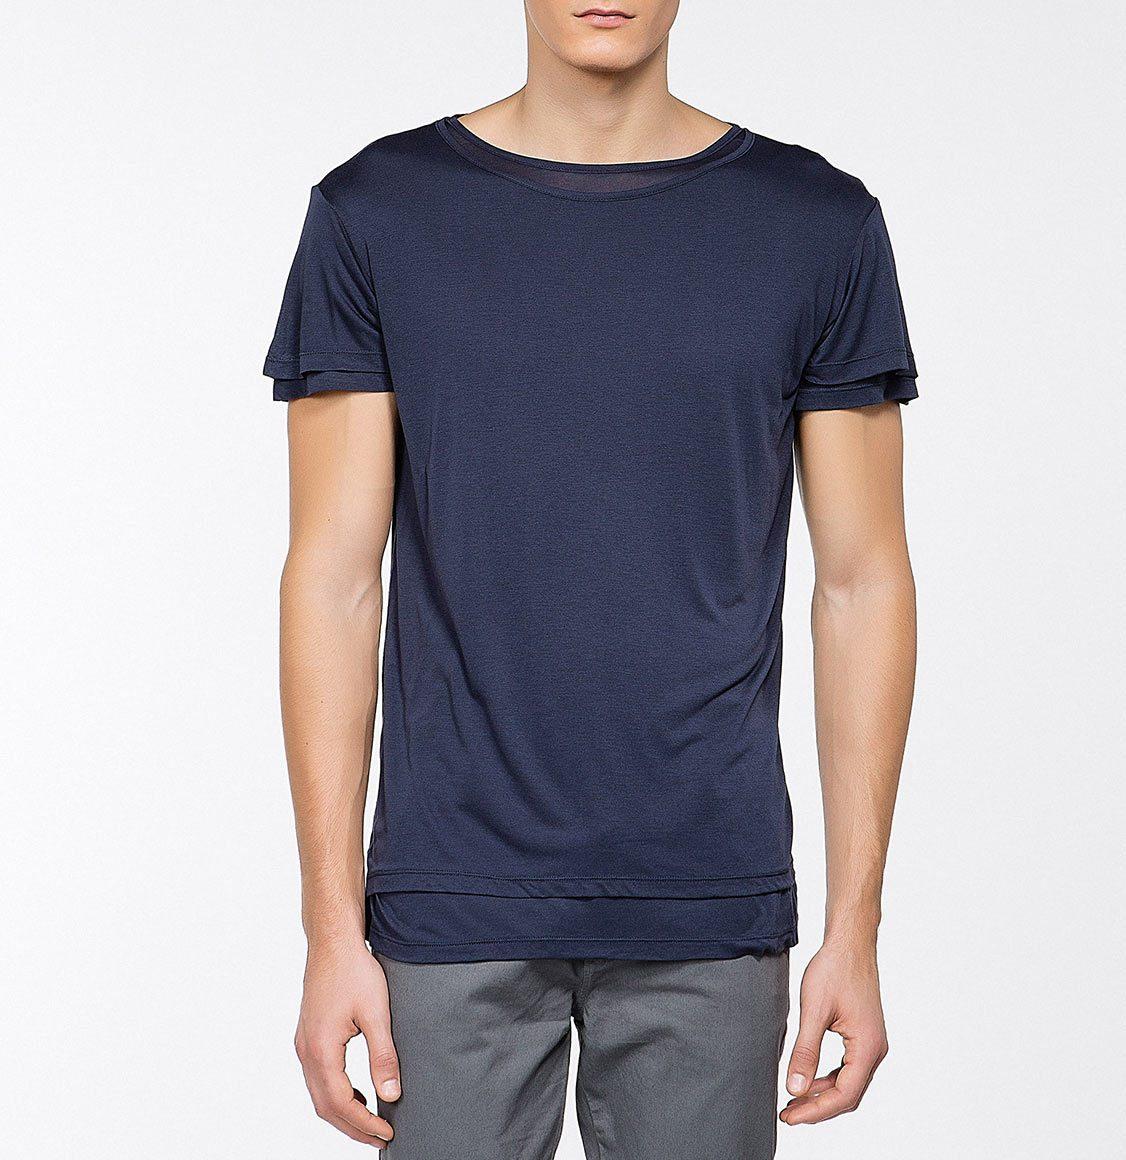 The Project Garments Silk Blend Double Crew Neck T-Shirt Navy Blue